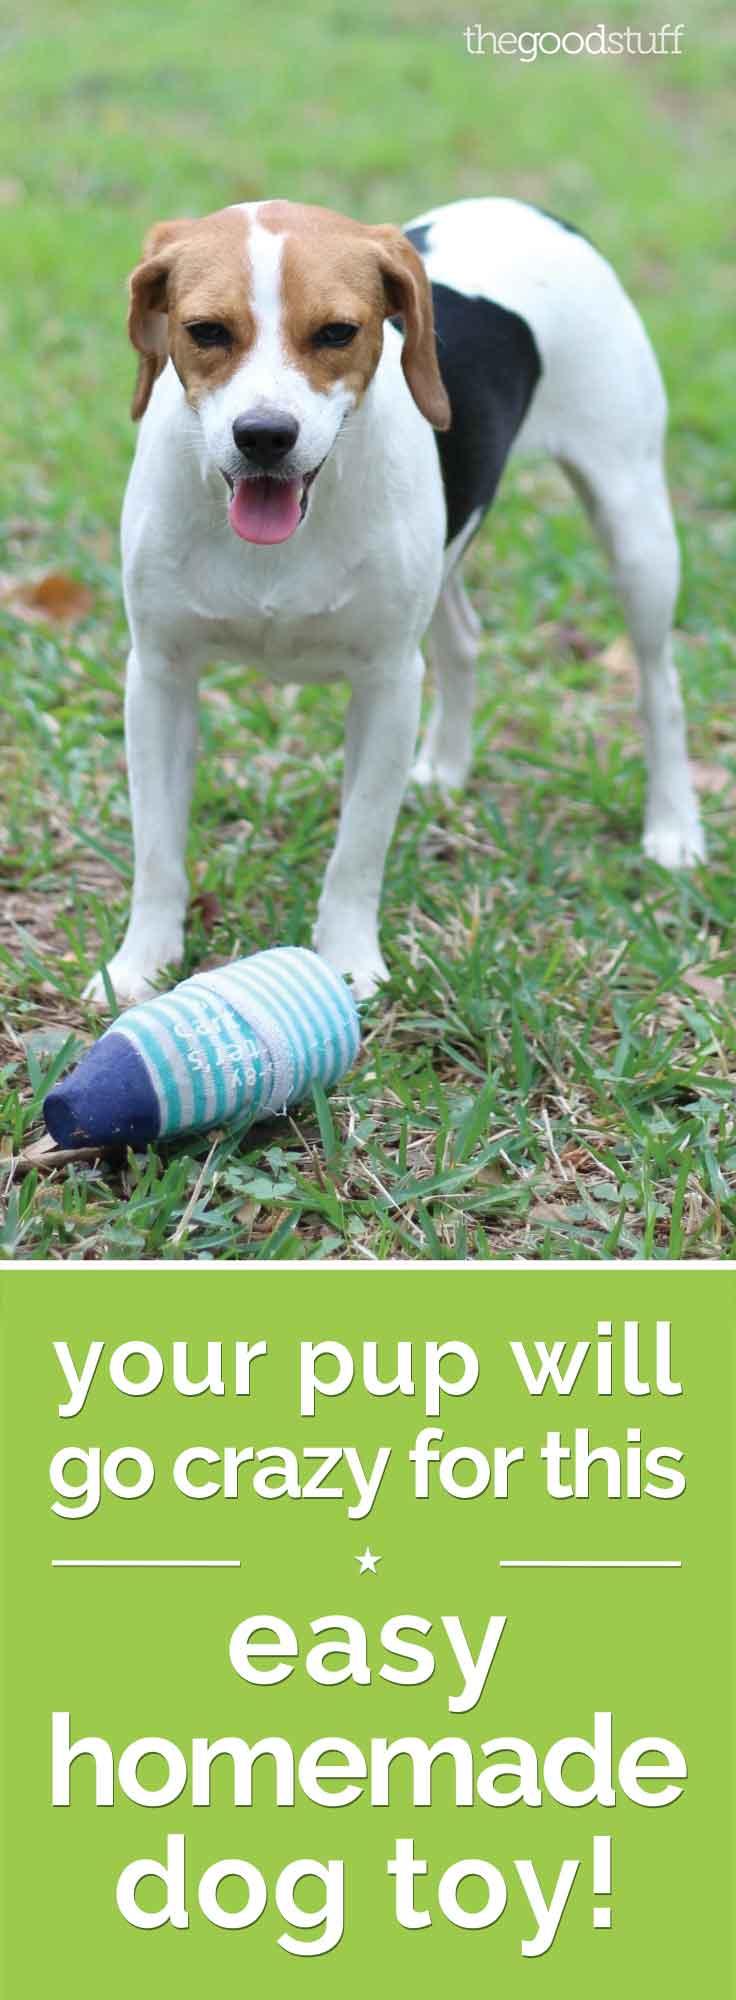 Homemade Dog Toys | thegoodstuff